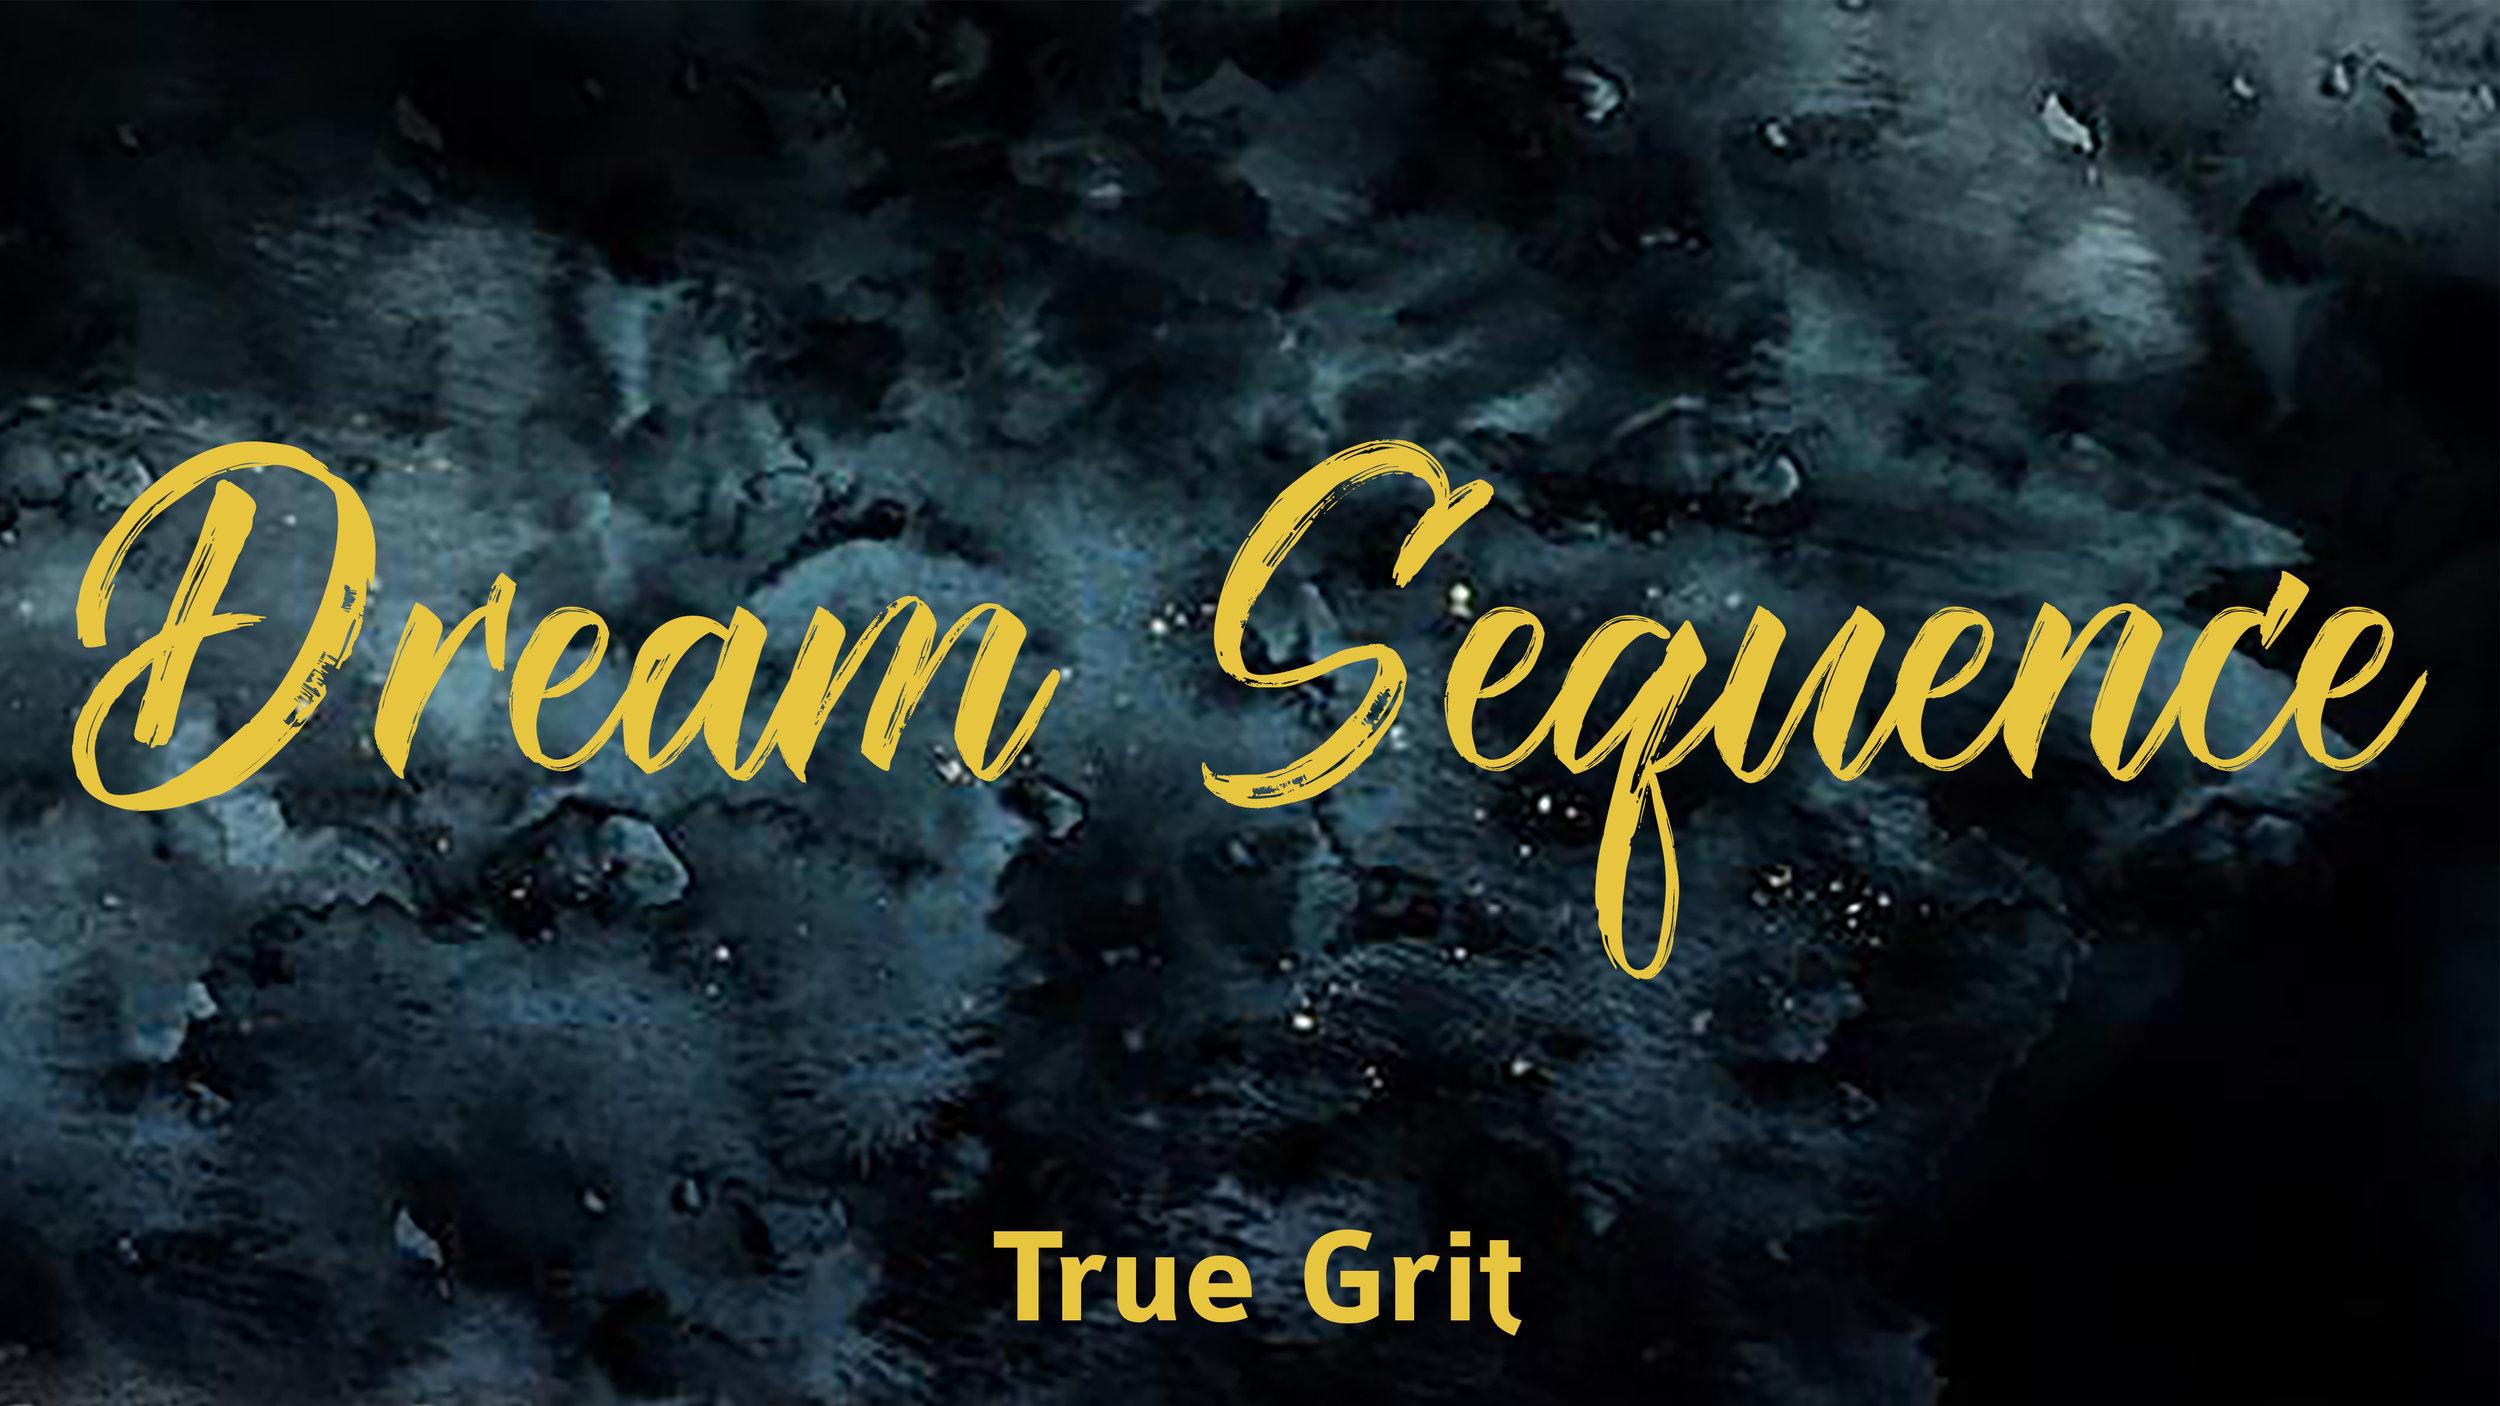 2016.12.18_DreamSequence_TrueGrit.jpg